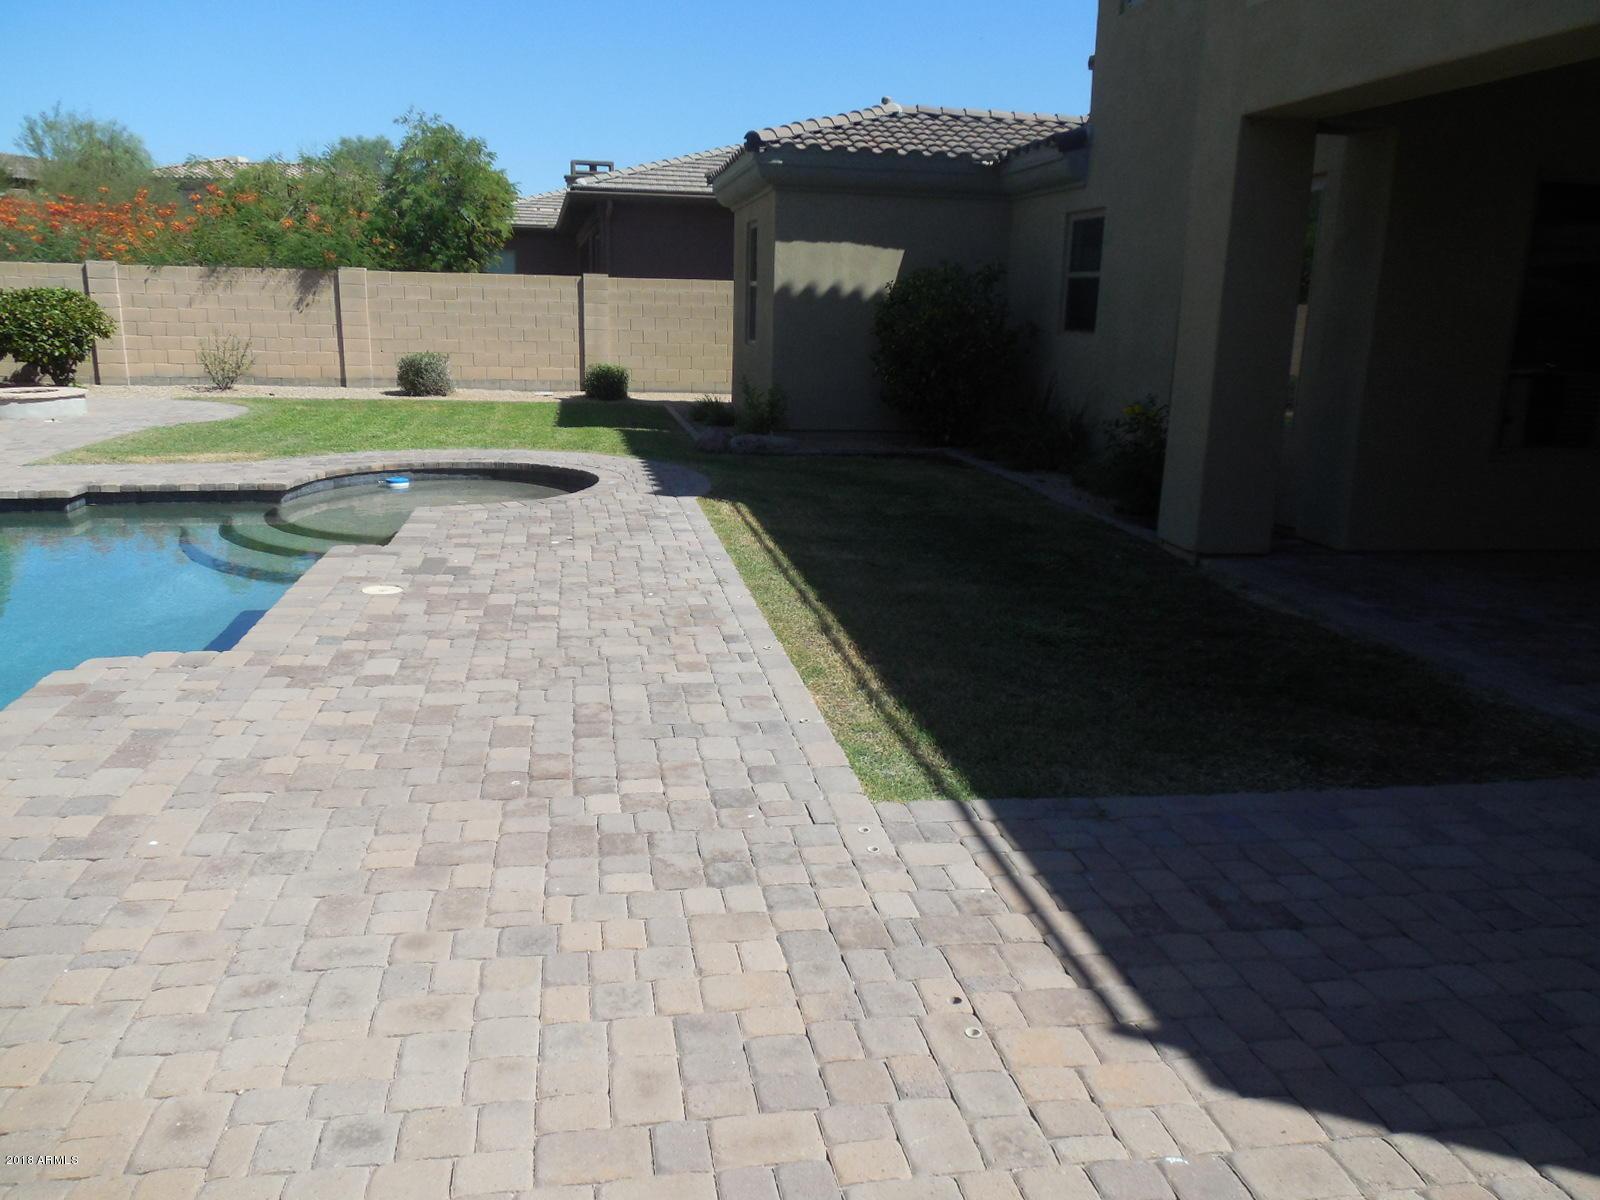 MLS 5814511 3822 E CIELO GRANDE Avenue, Phoenix, AZ 85050 Phoenix AZ REO Bank Owned Foreclosure